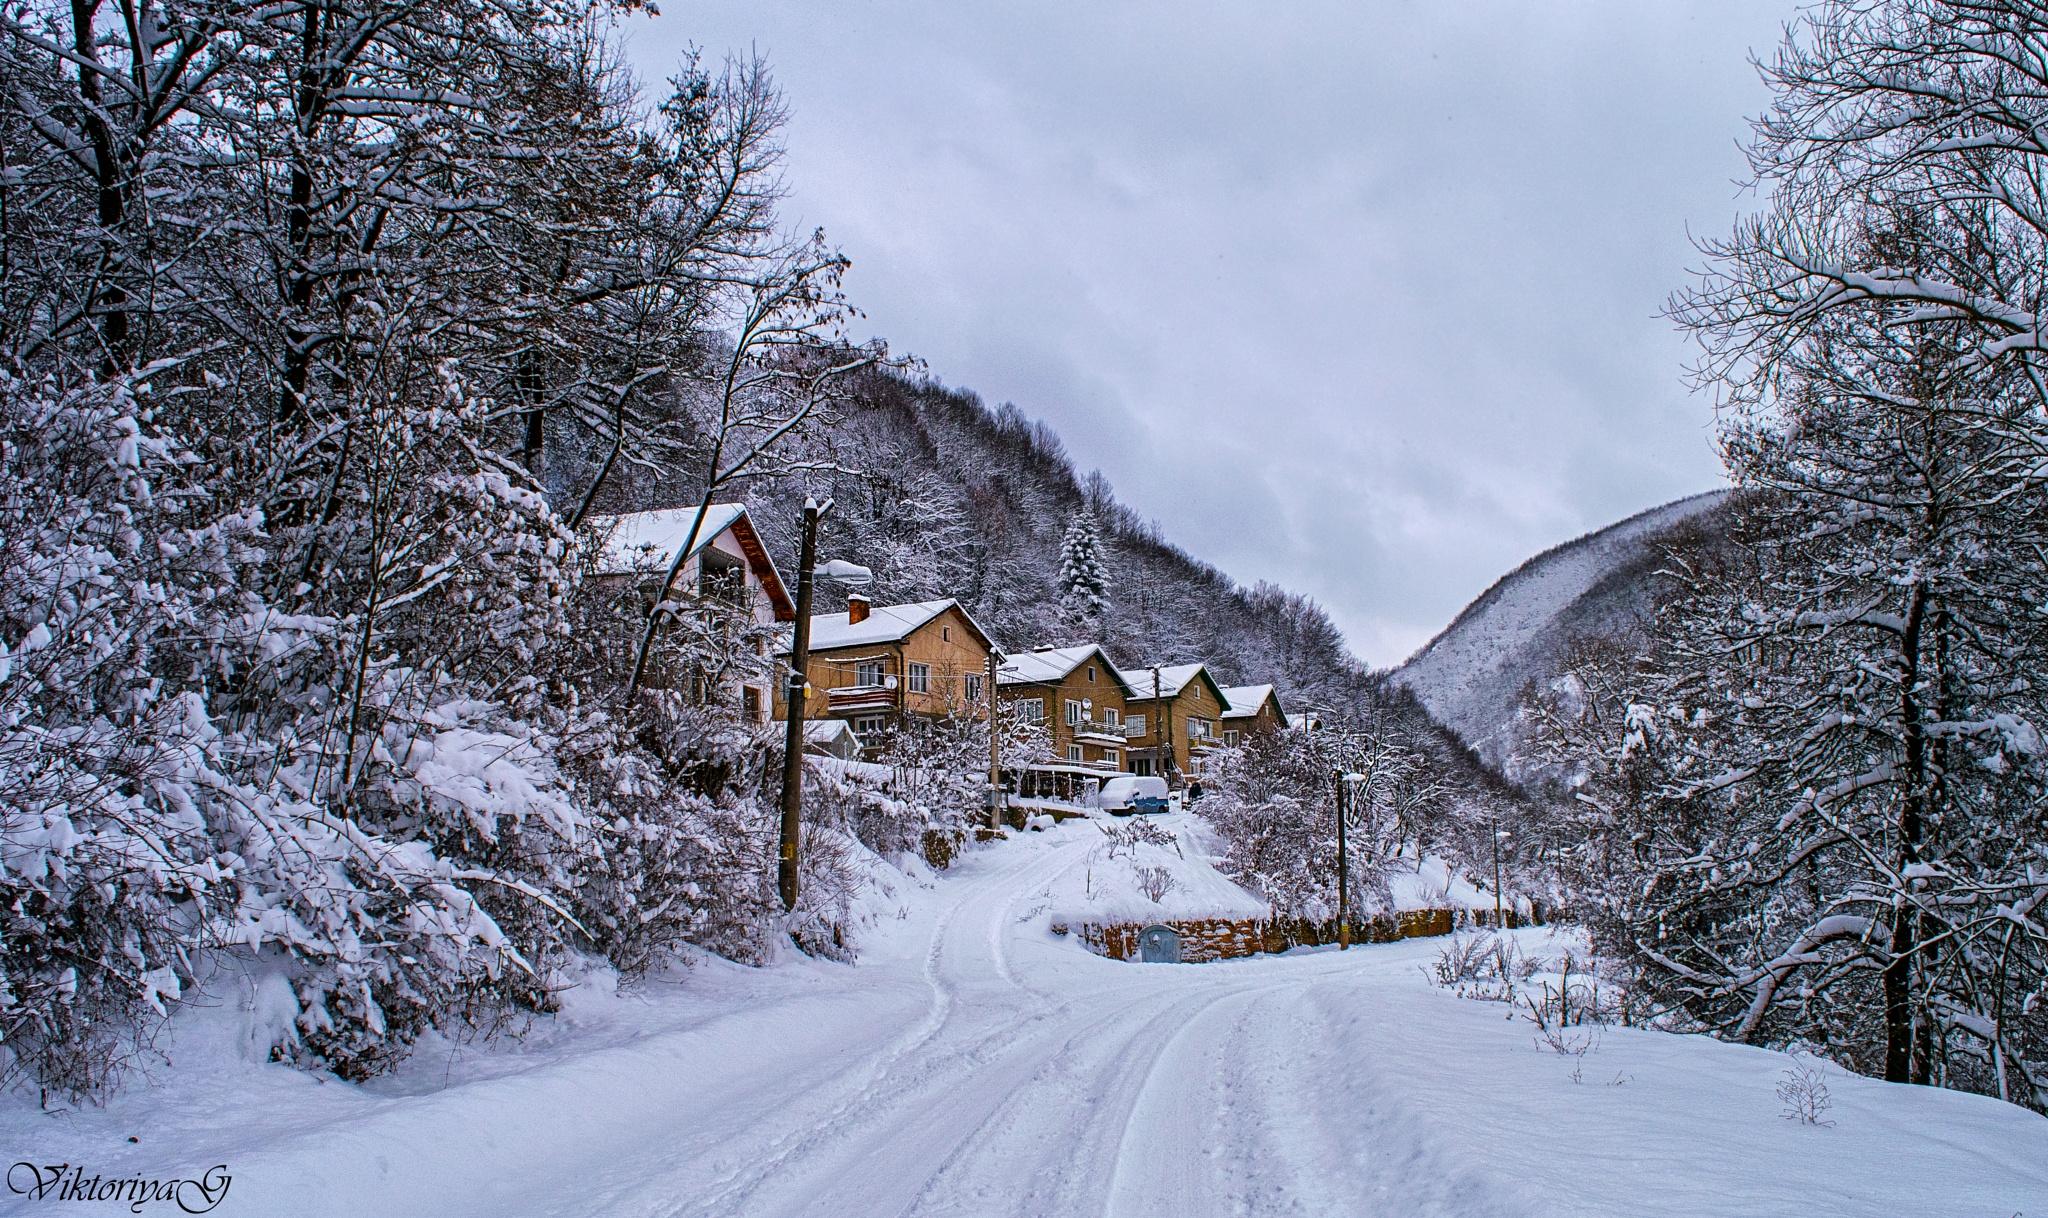 In the middle of winter by Viktoriya Georgieva